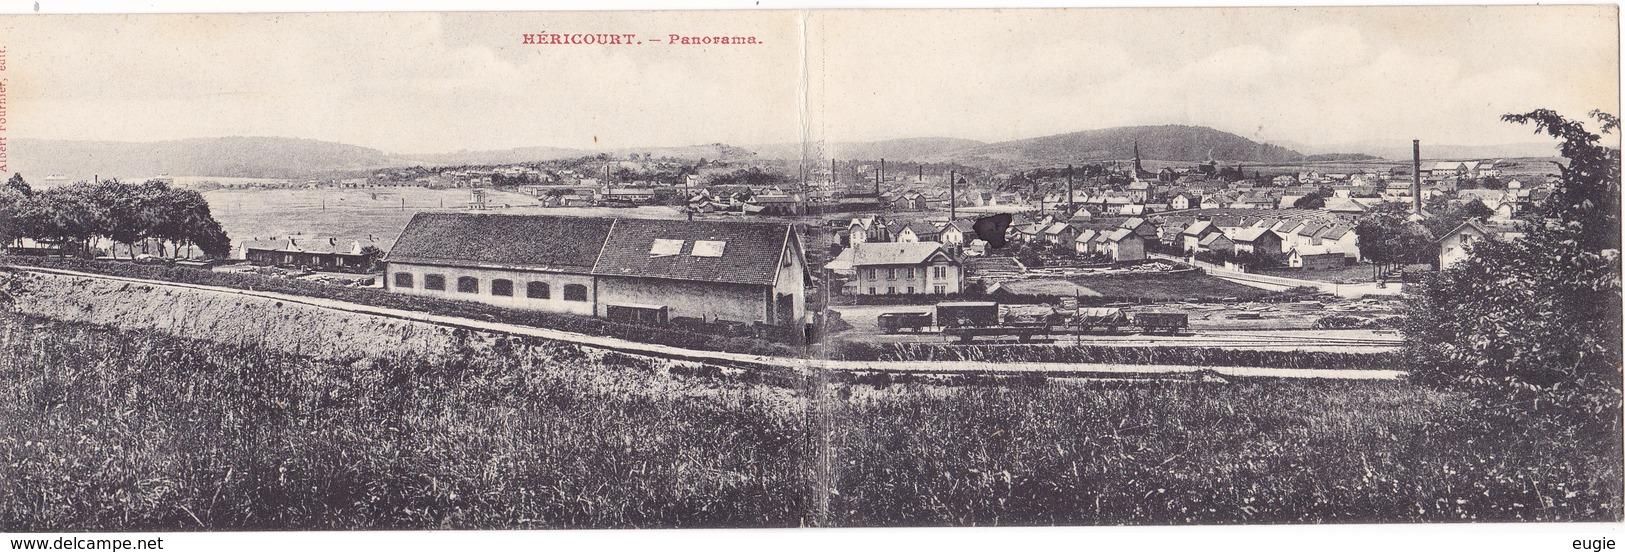 732/ Hericourt, Panorama, Dubbele Kaart - Francia